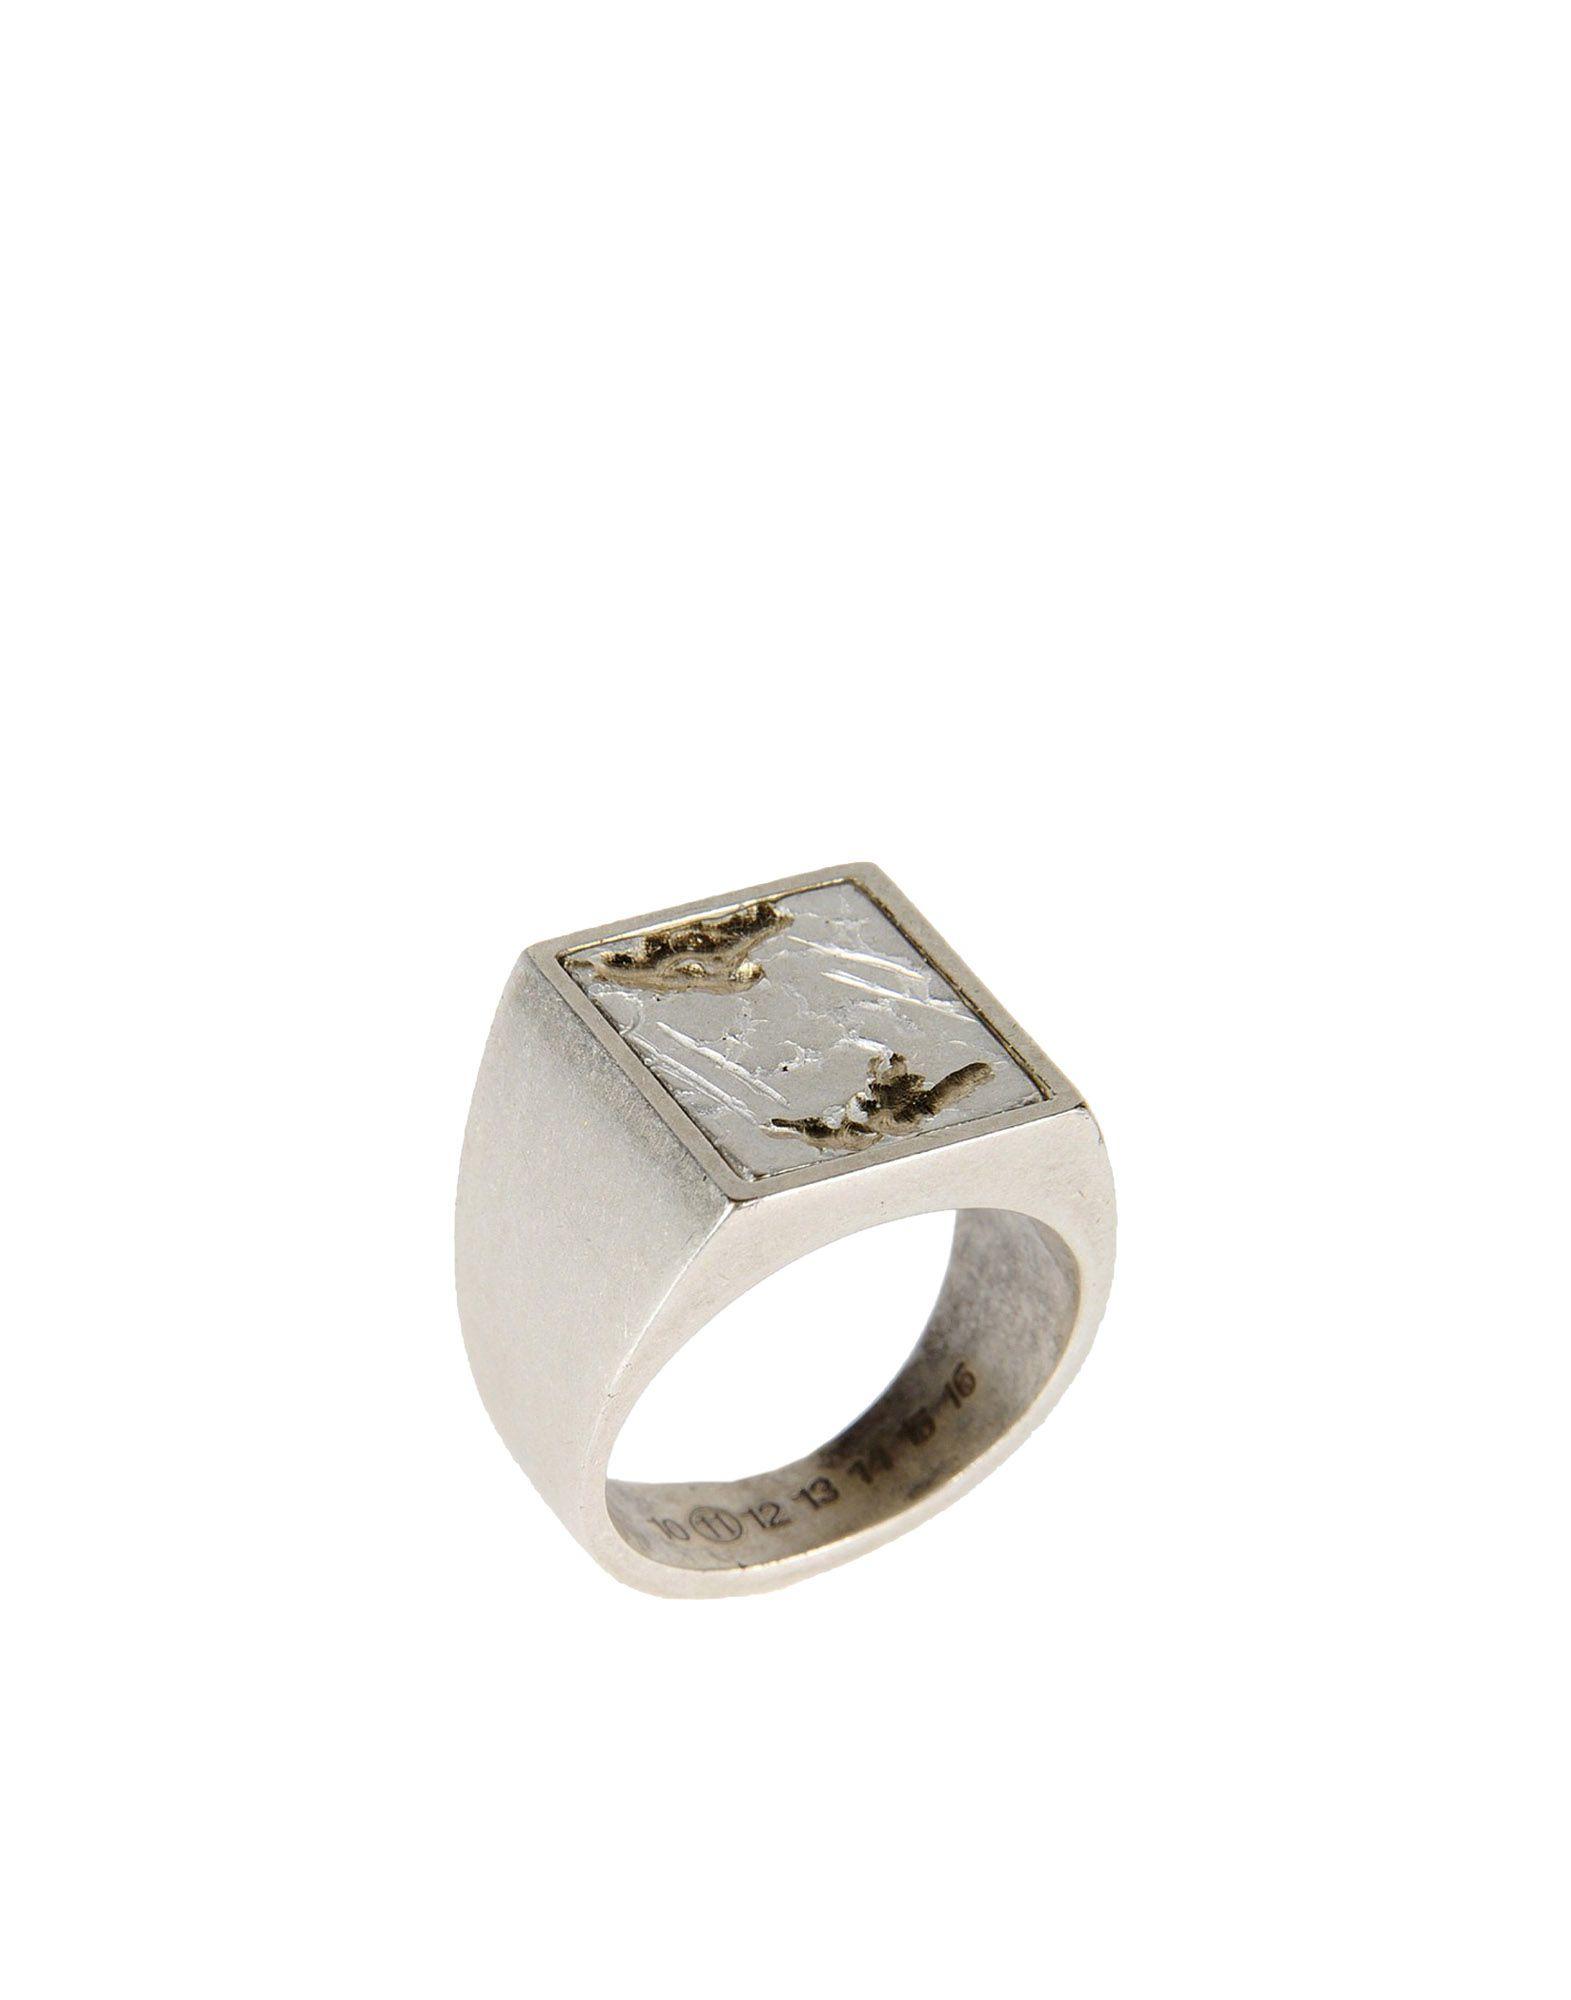 maison margiela ring in metallic for men lyst. Black Bedroom Furniture Sets. Home Design Ideas